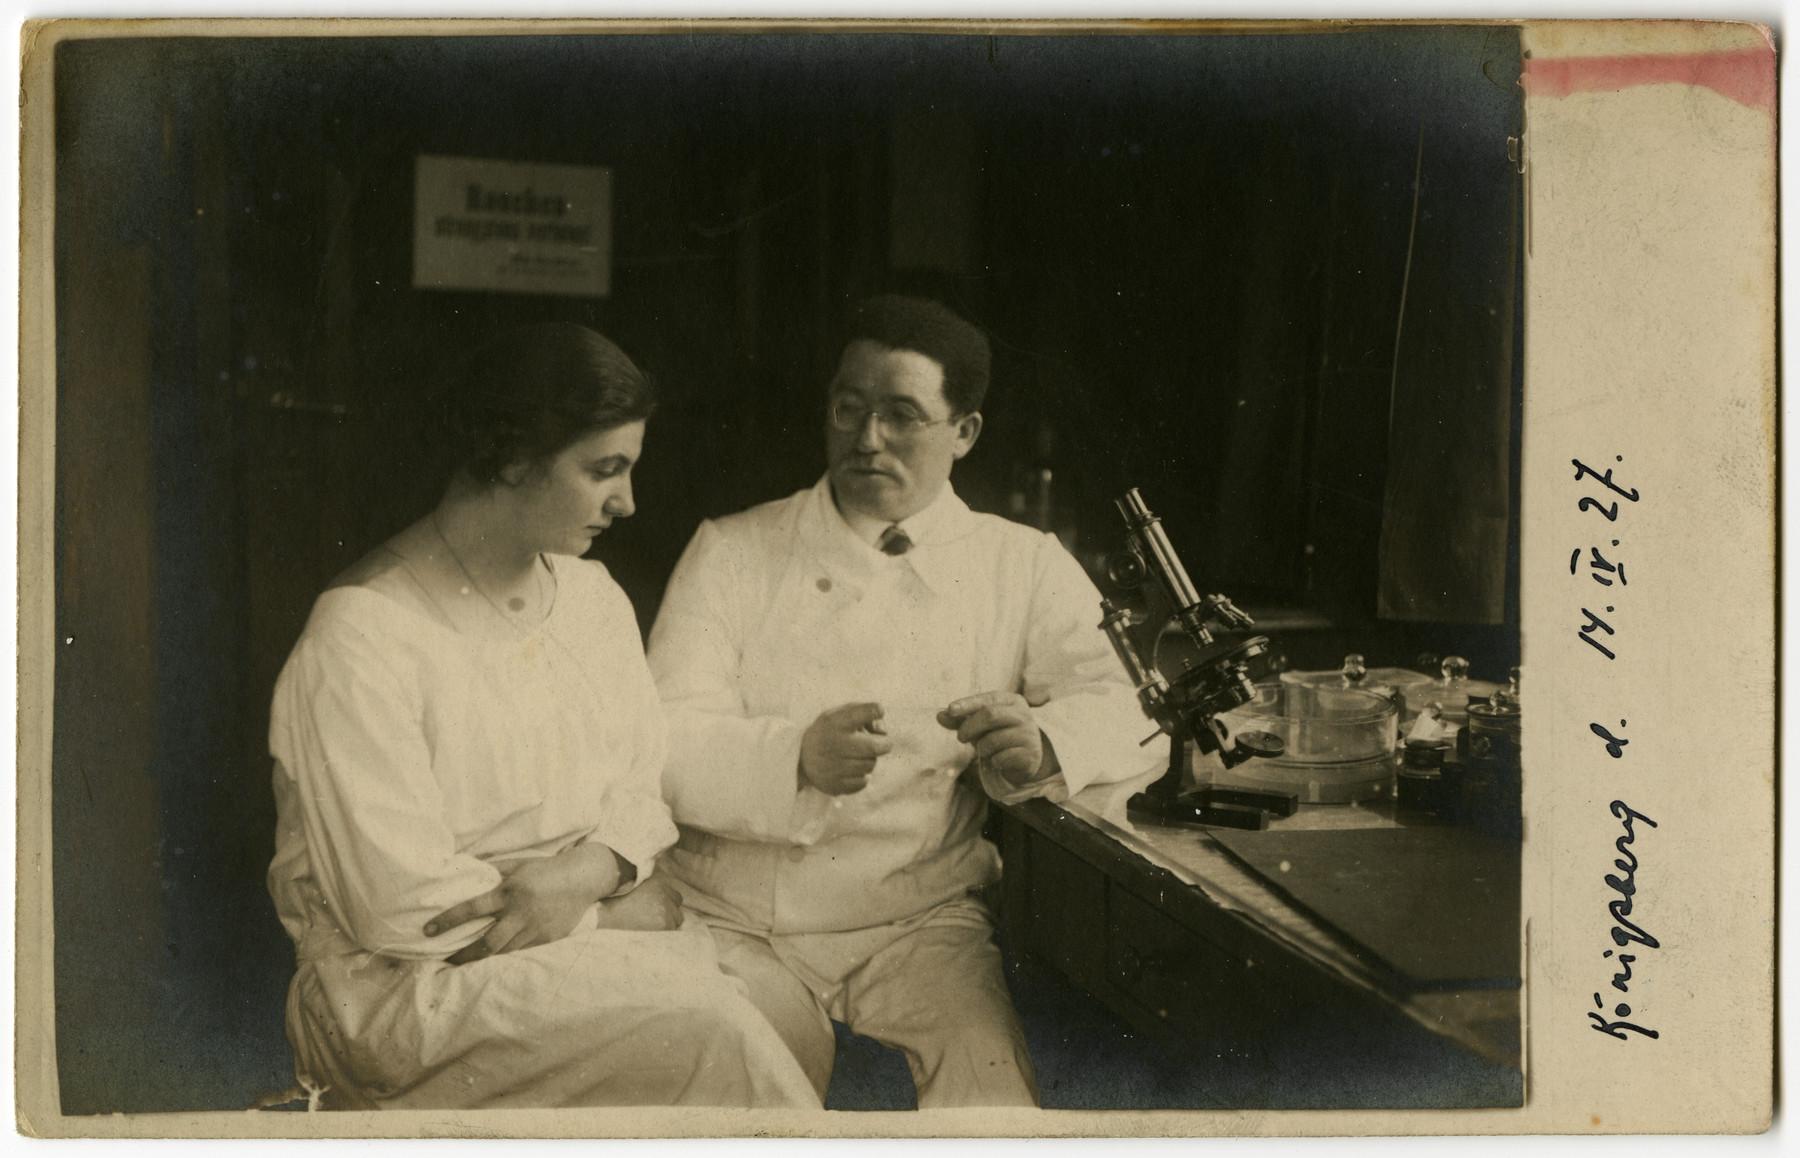 Dr. Hirsch (Tzvi) Elkes (brother of Elkhanan Elkes) works in hs physician's lab in prewar Koenigsberg.